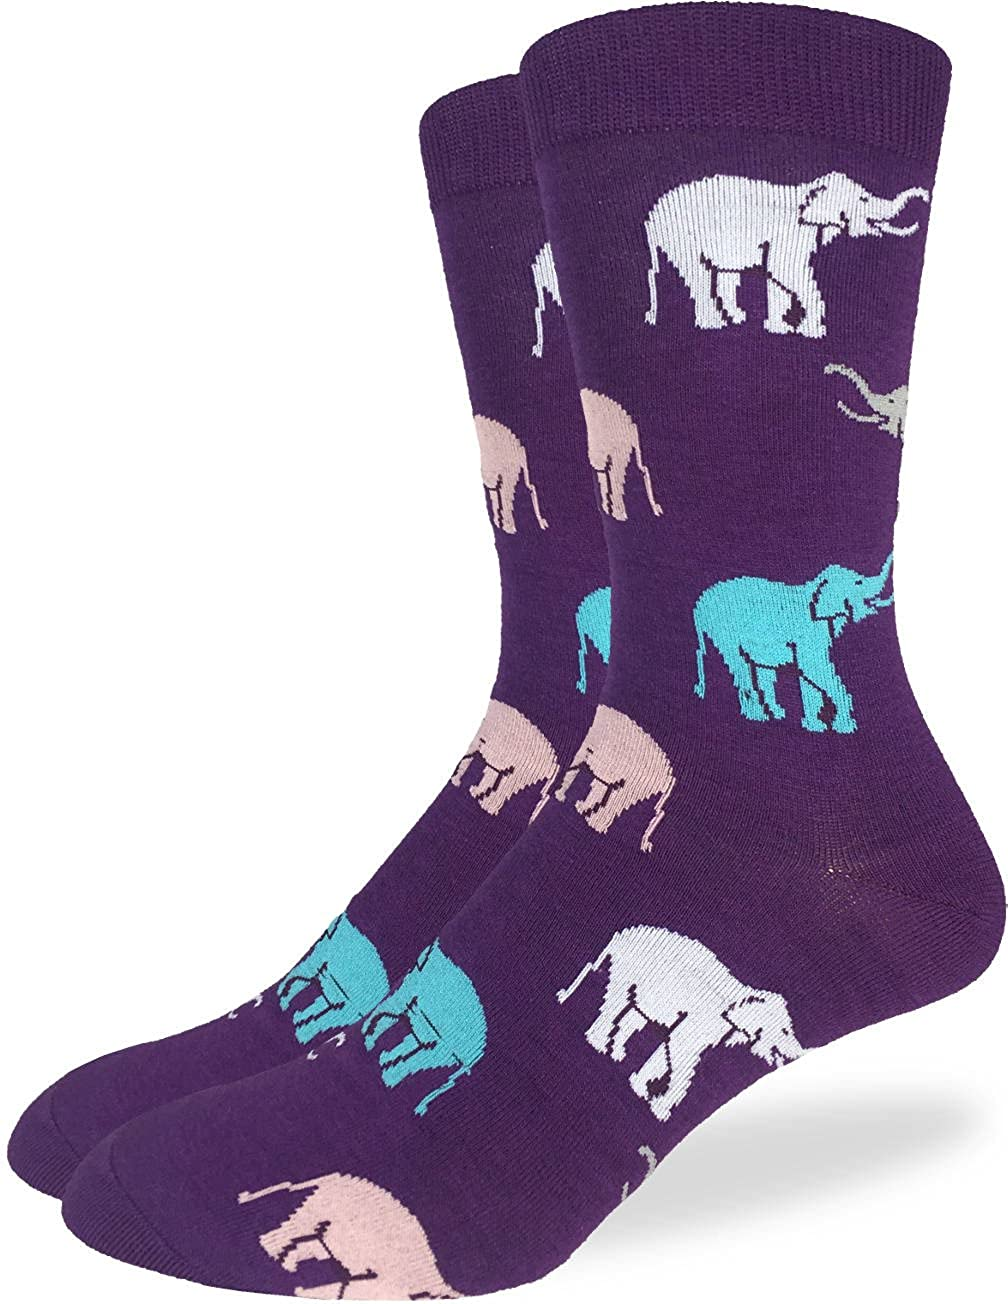 Good Luck Sock Men's Purple Elephant Crew Socks - Purple, Adult Shoe size 7-12 1263